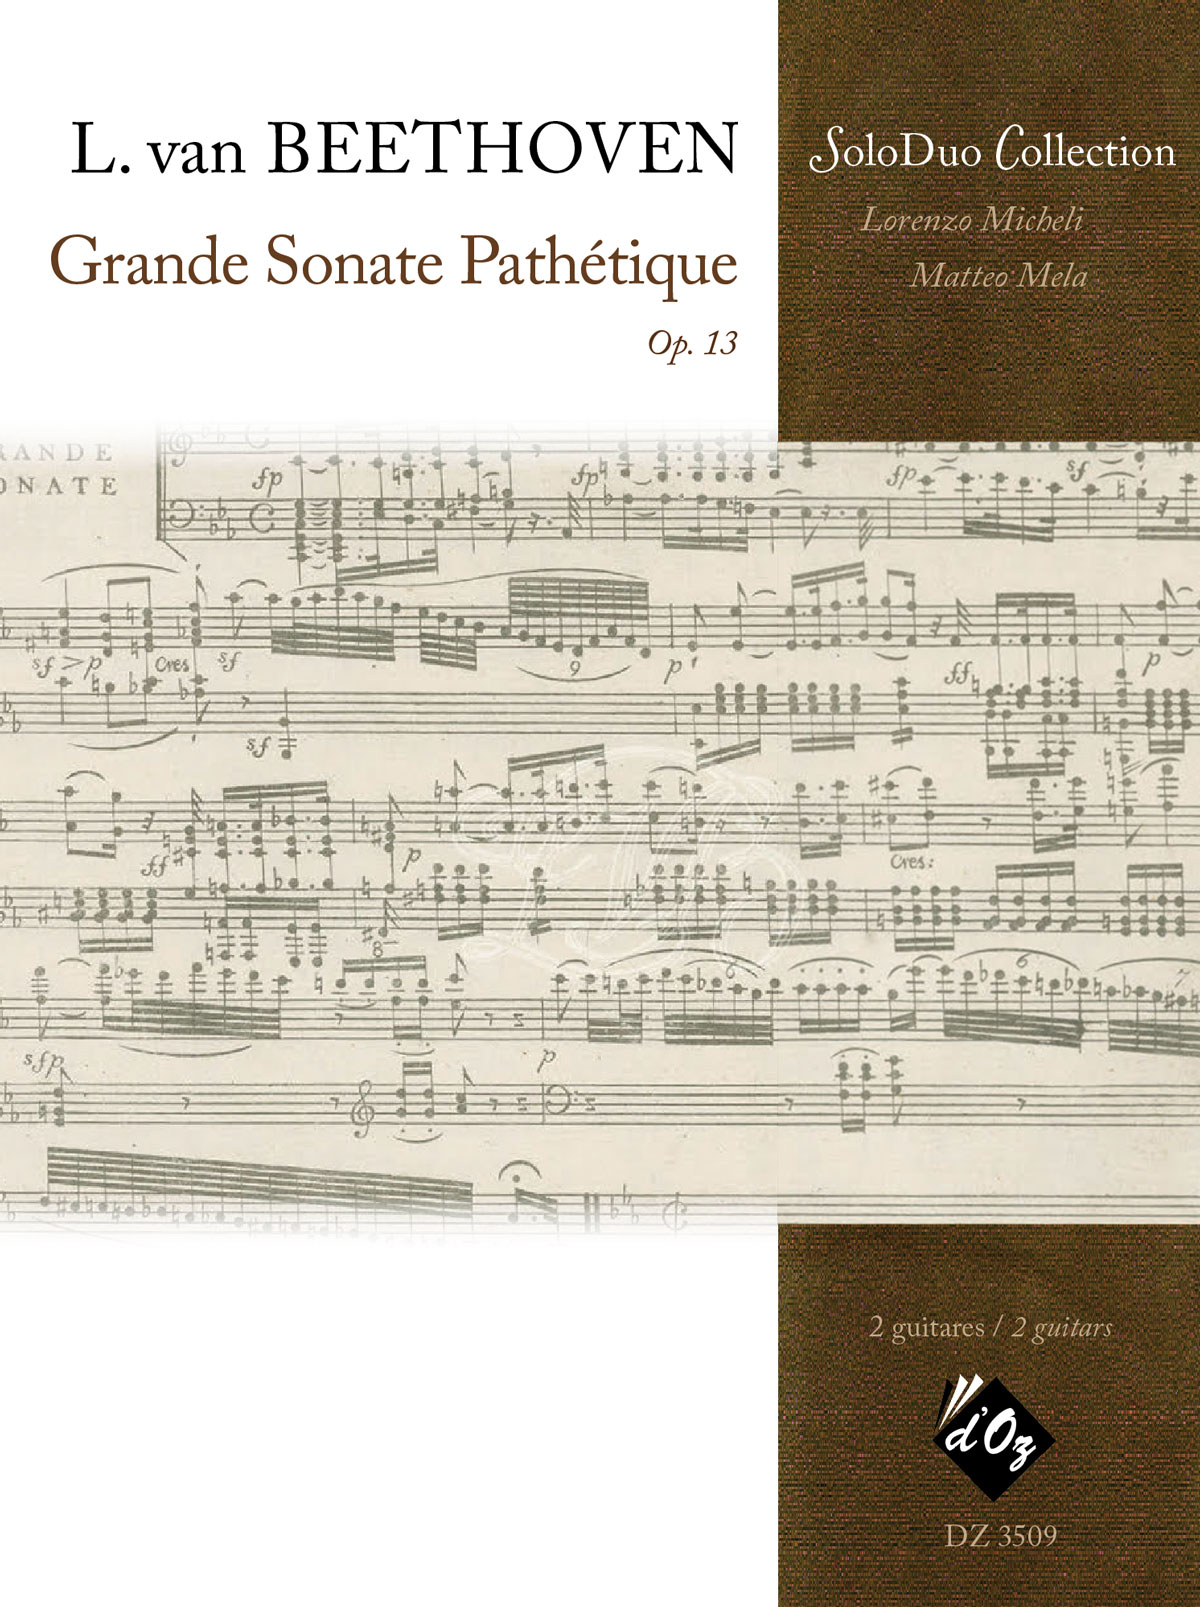 Grande sonate pathétique, opus 13